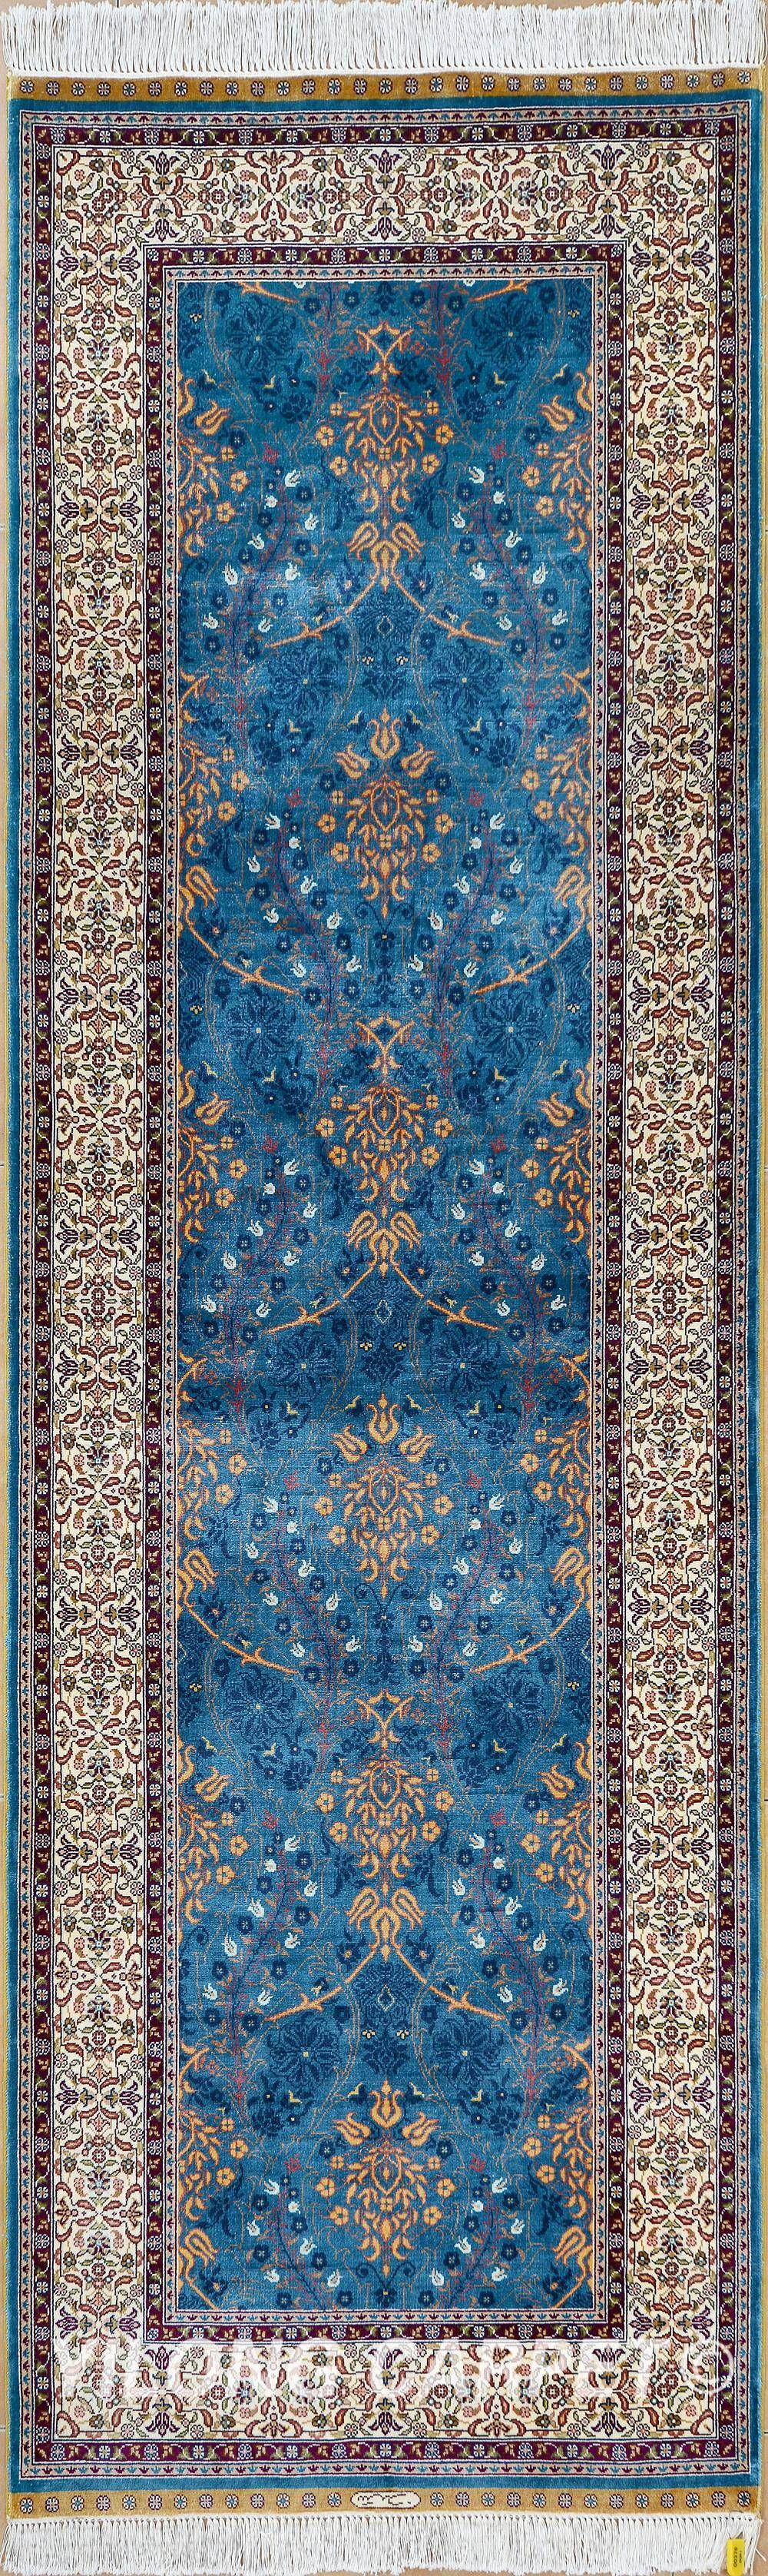 Blue Rug Runner Persian Oriental Turkish Carpet Hand Knotted Silk Tabriz Rugs Hereke Area